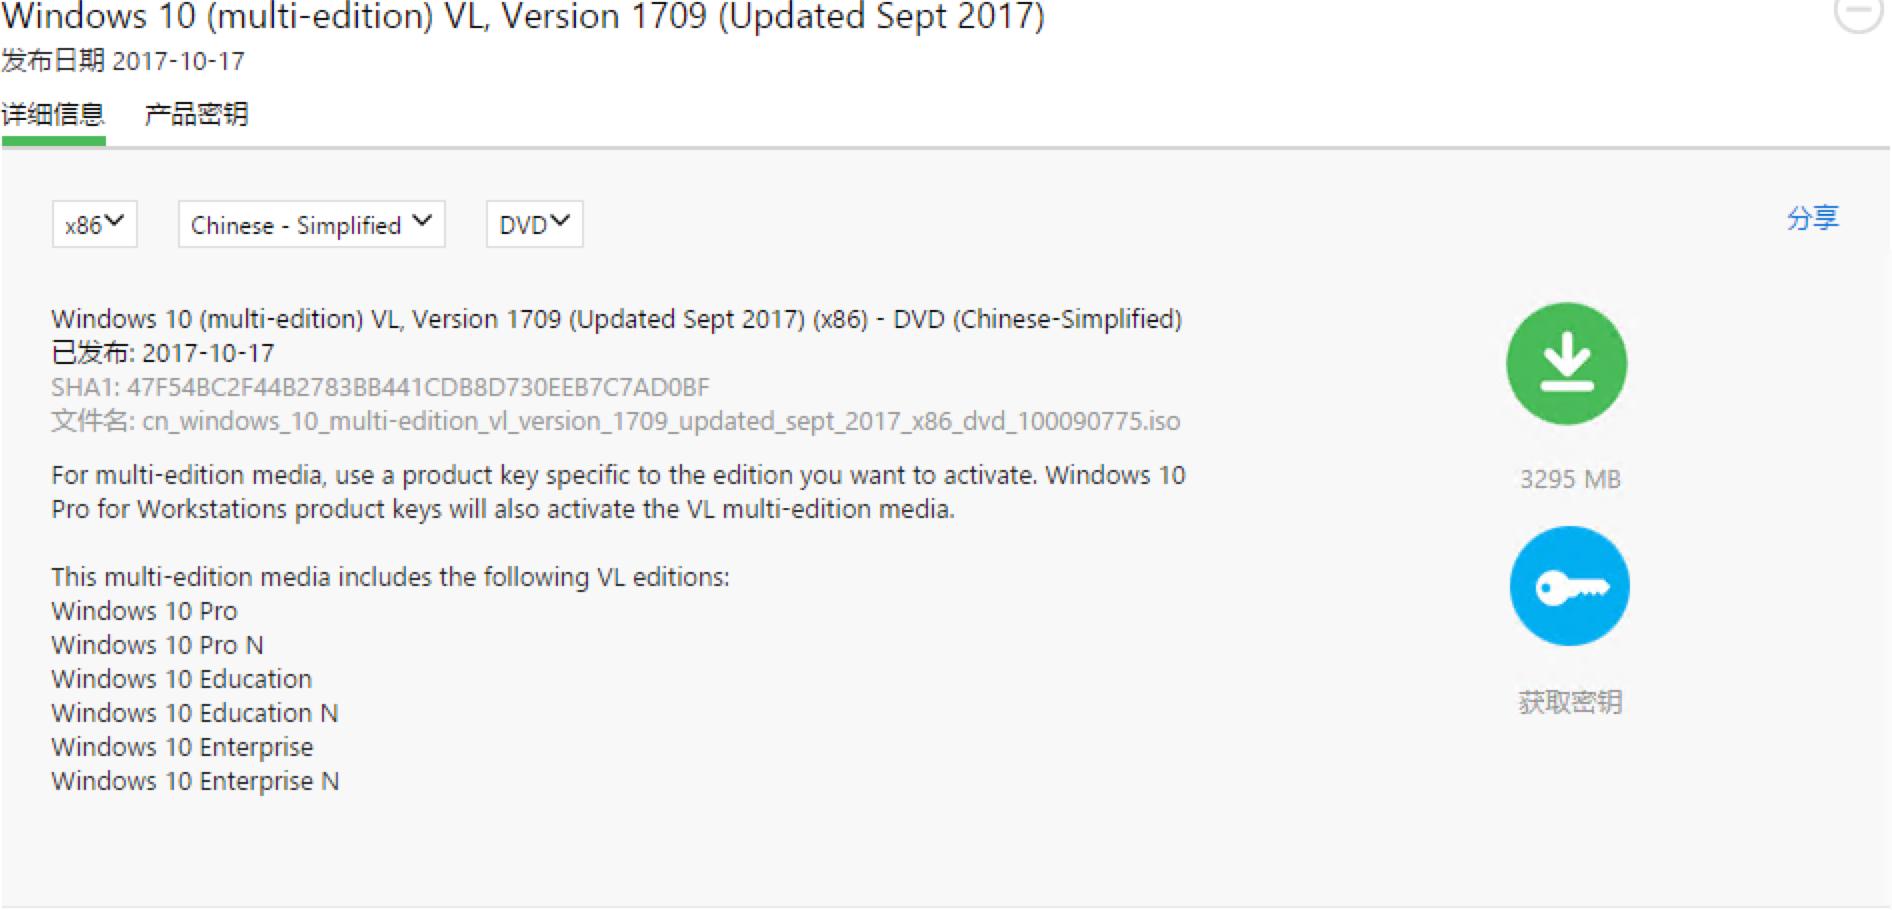 Windows 10 Version 1709 (Updated Sept 2017)简体中文镜像下载-豆豆博客